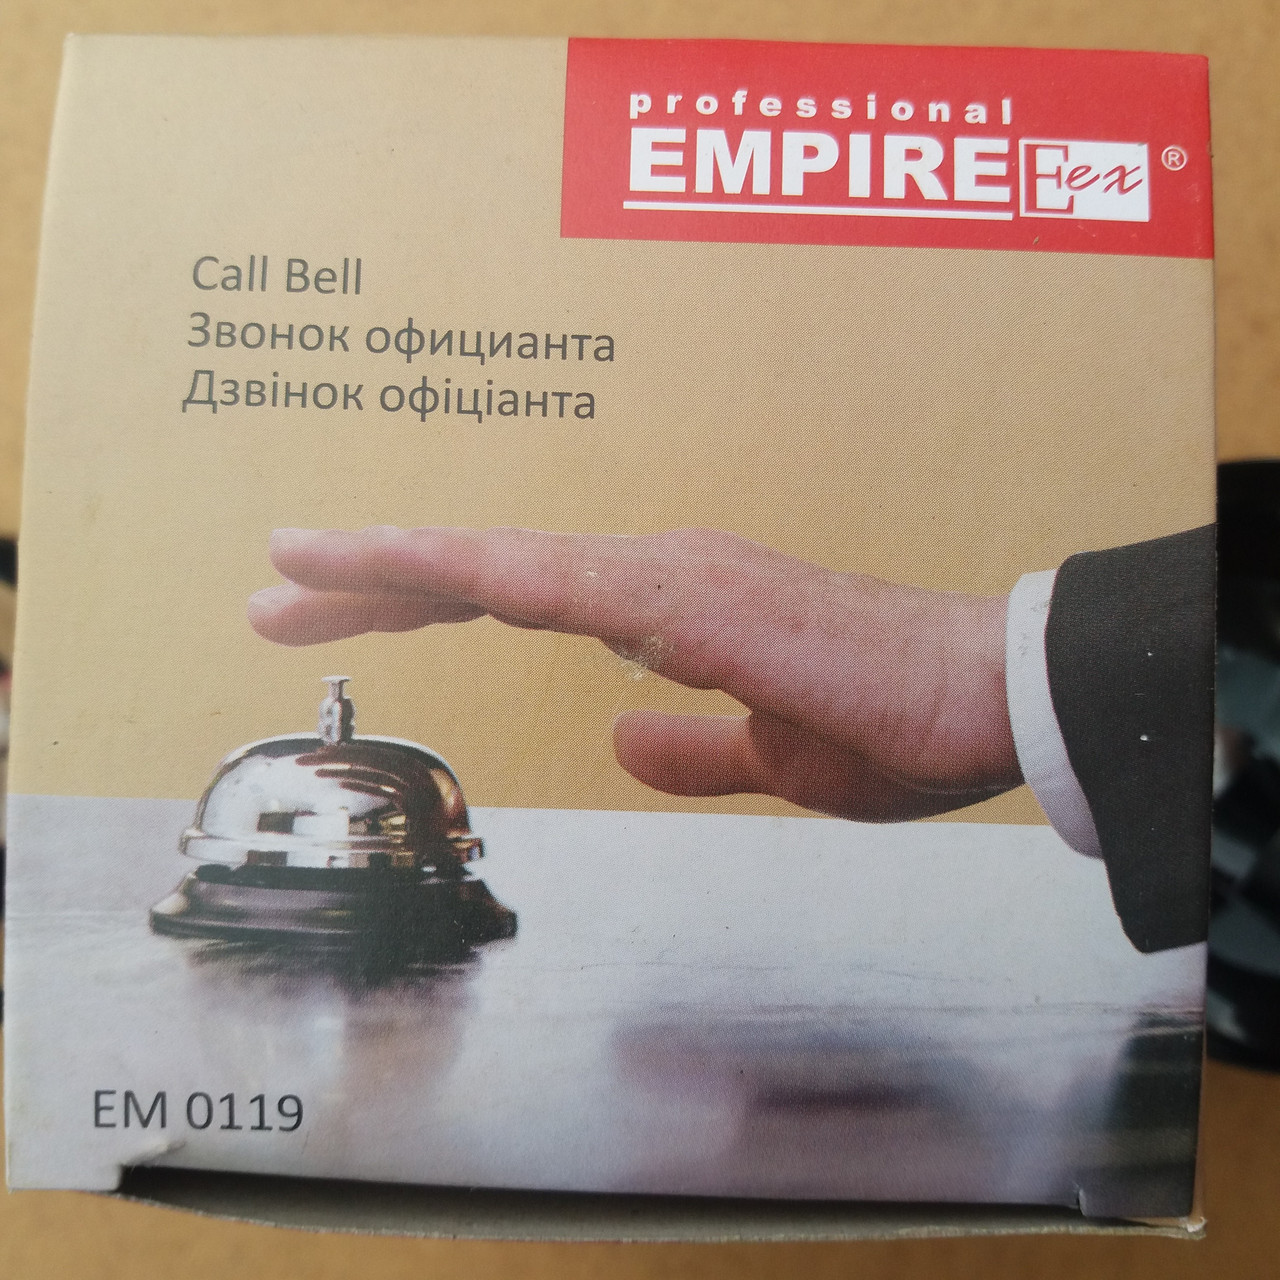 Звонок официанта, диаметр 85 мм., EMPIRE, код 0119